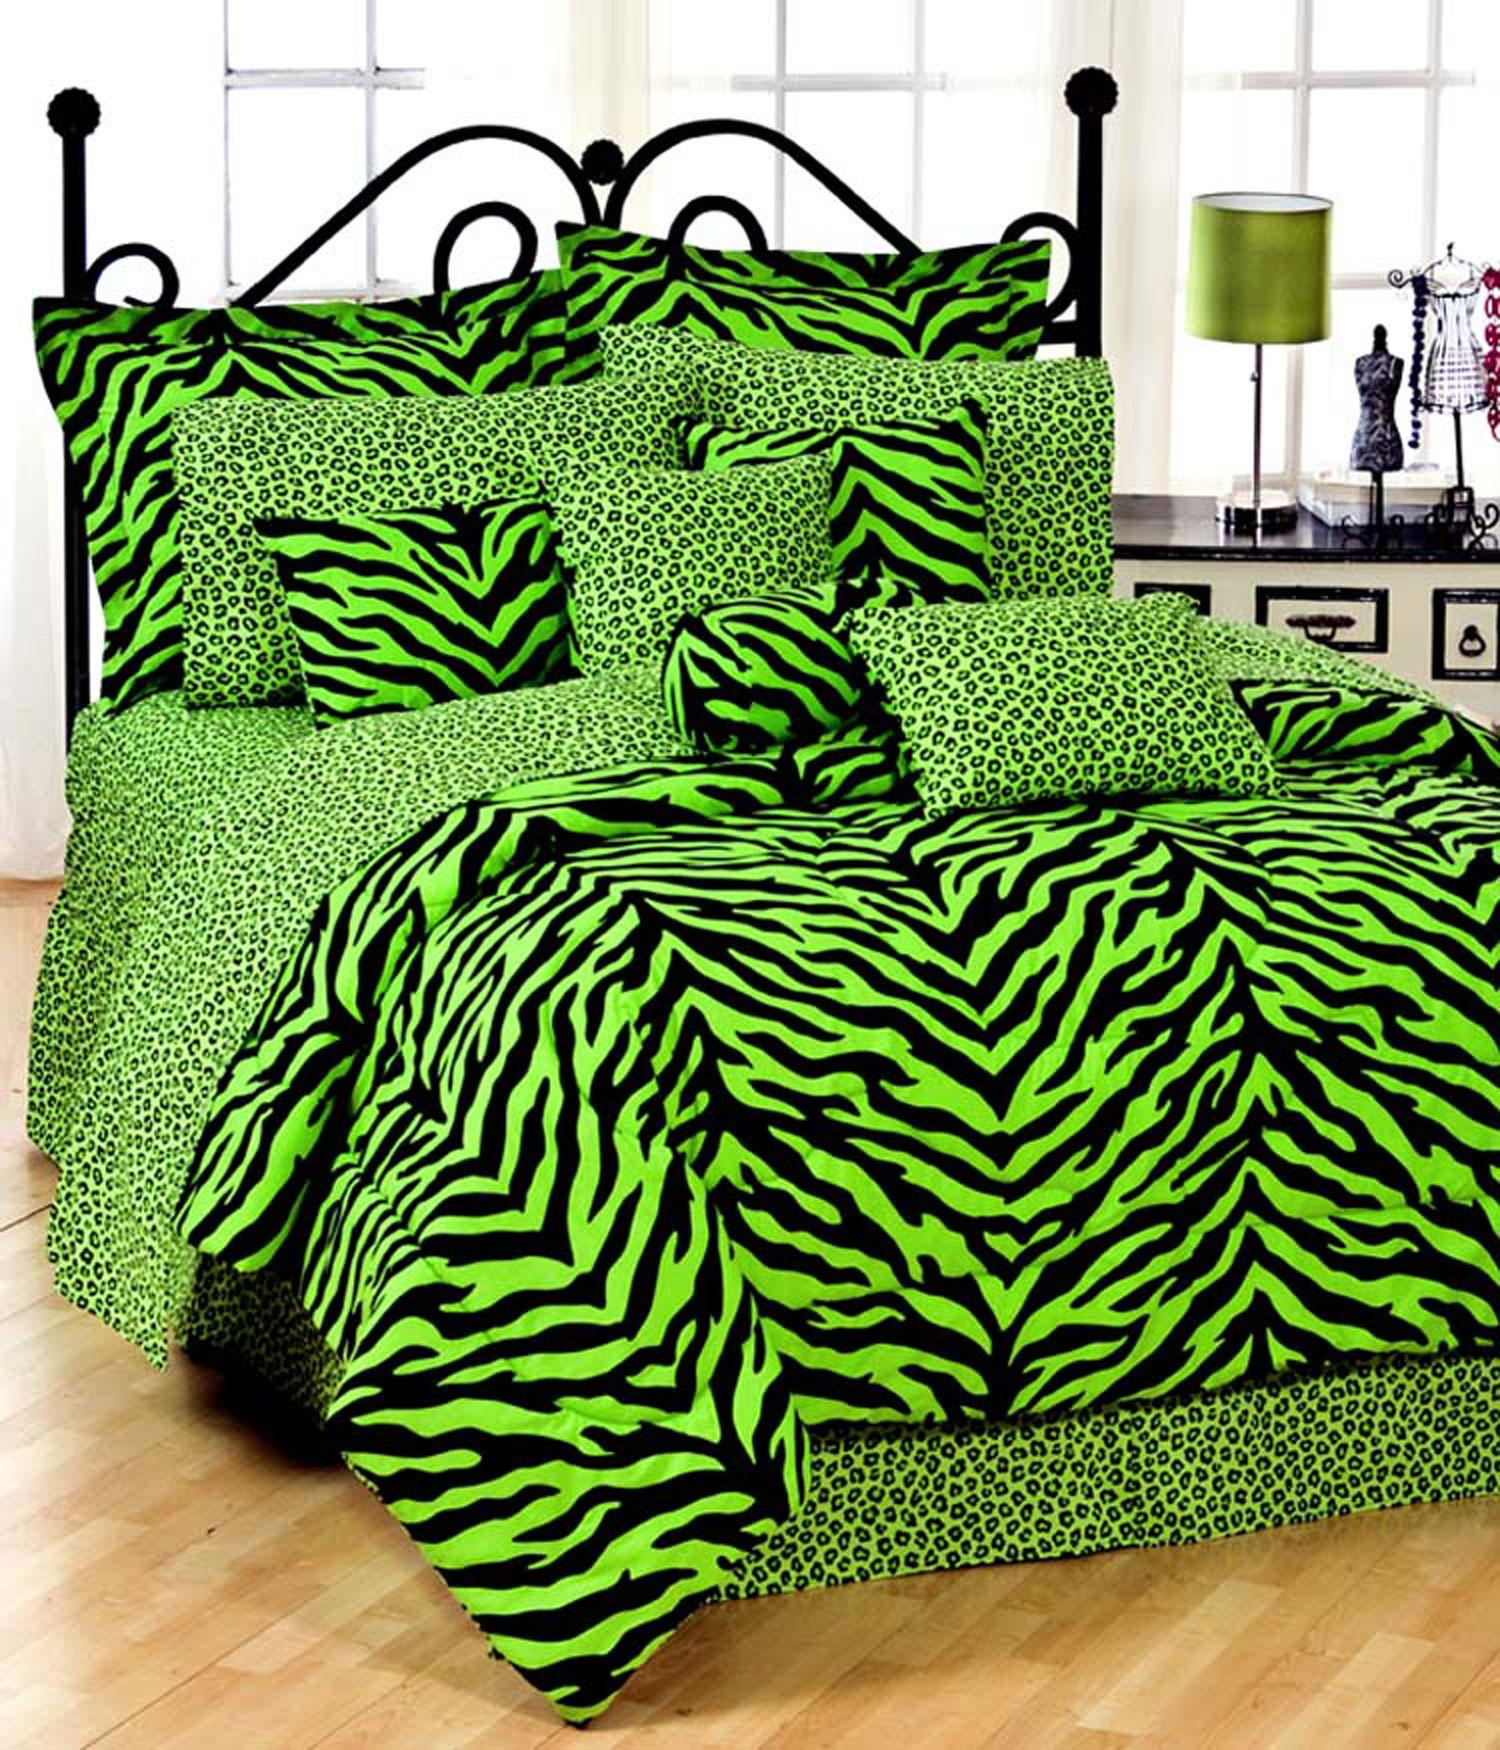 Bed sets for teenage girls zebra - Zoom In